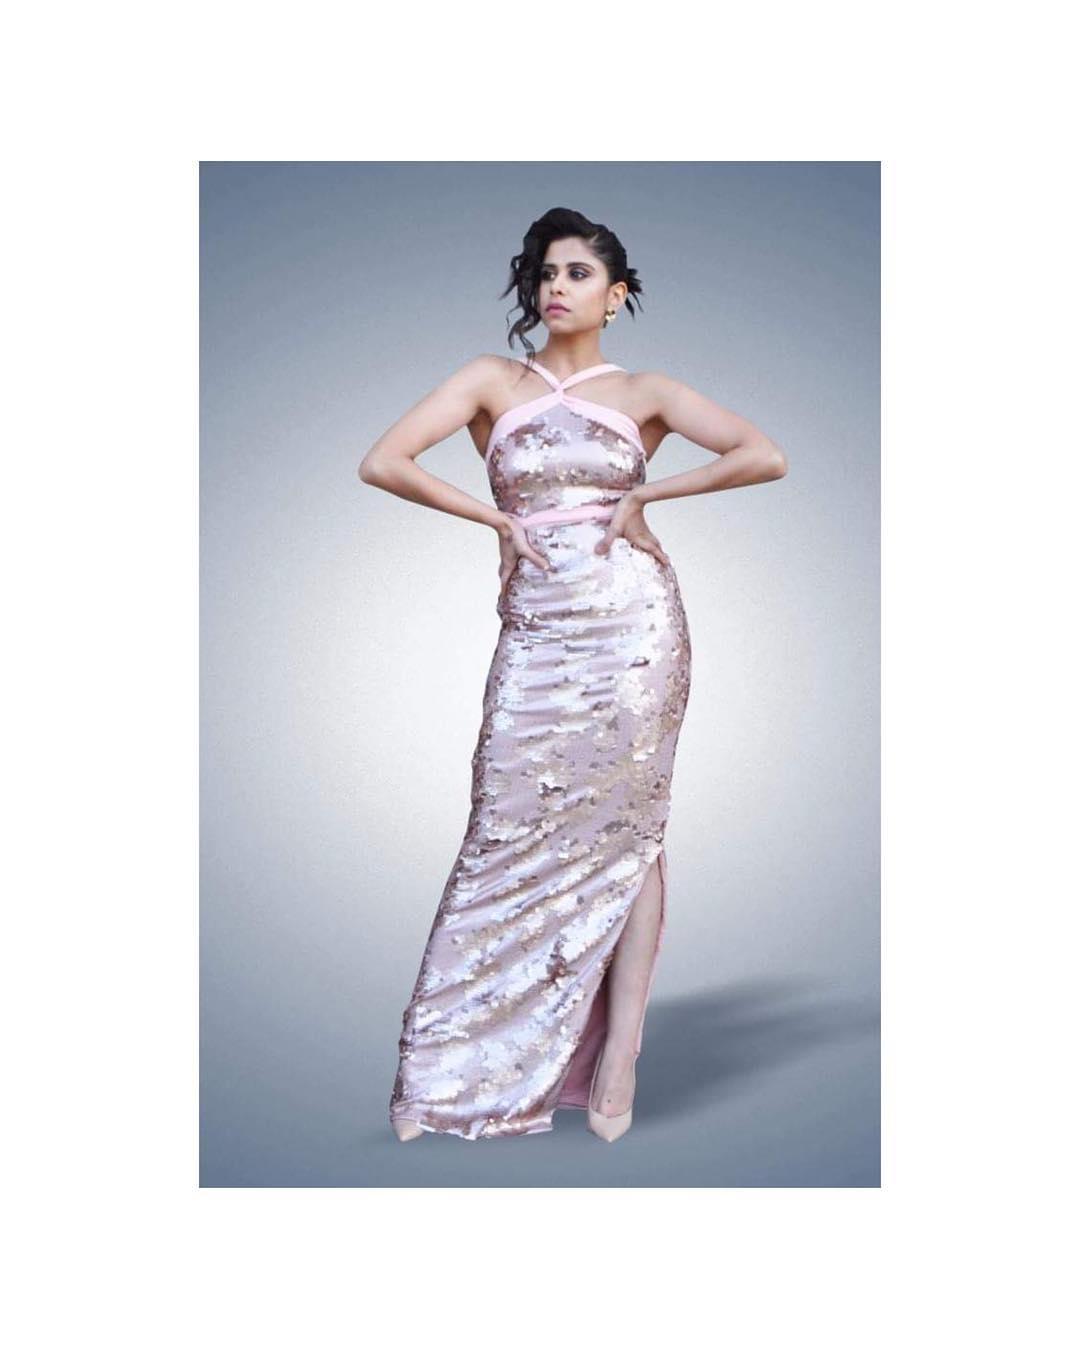 Sai Tamhankar marathi actress 41